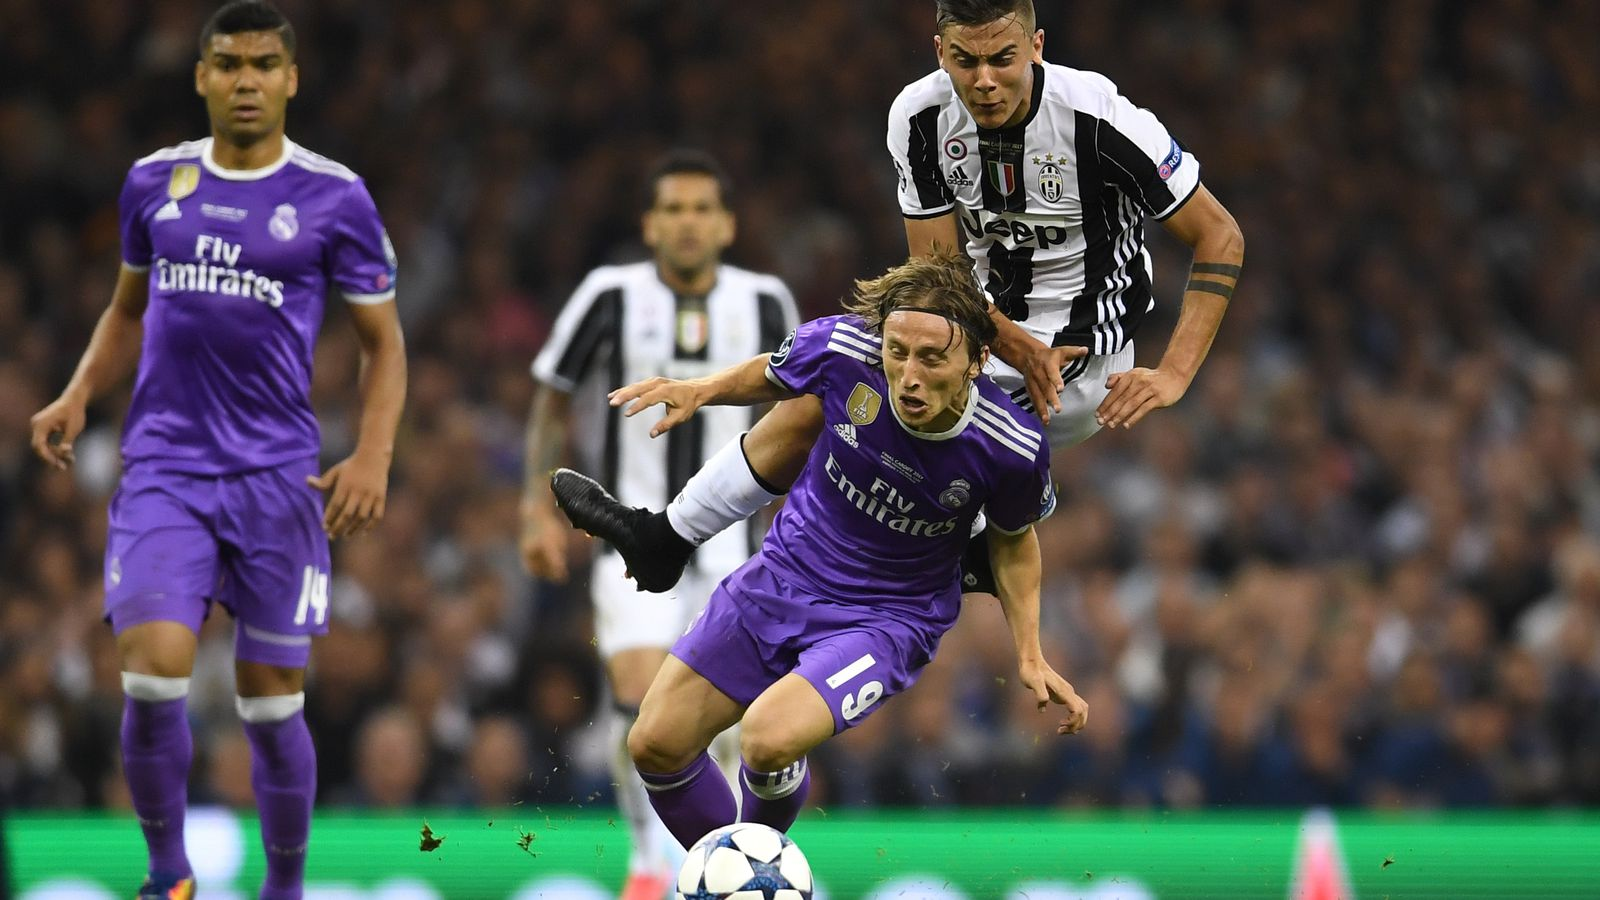 Managing Madrid A Real Madrid Community: Managing Madrid Podcast: Transfer Talk, Real Madrid's